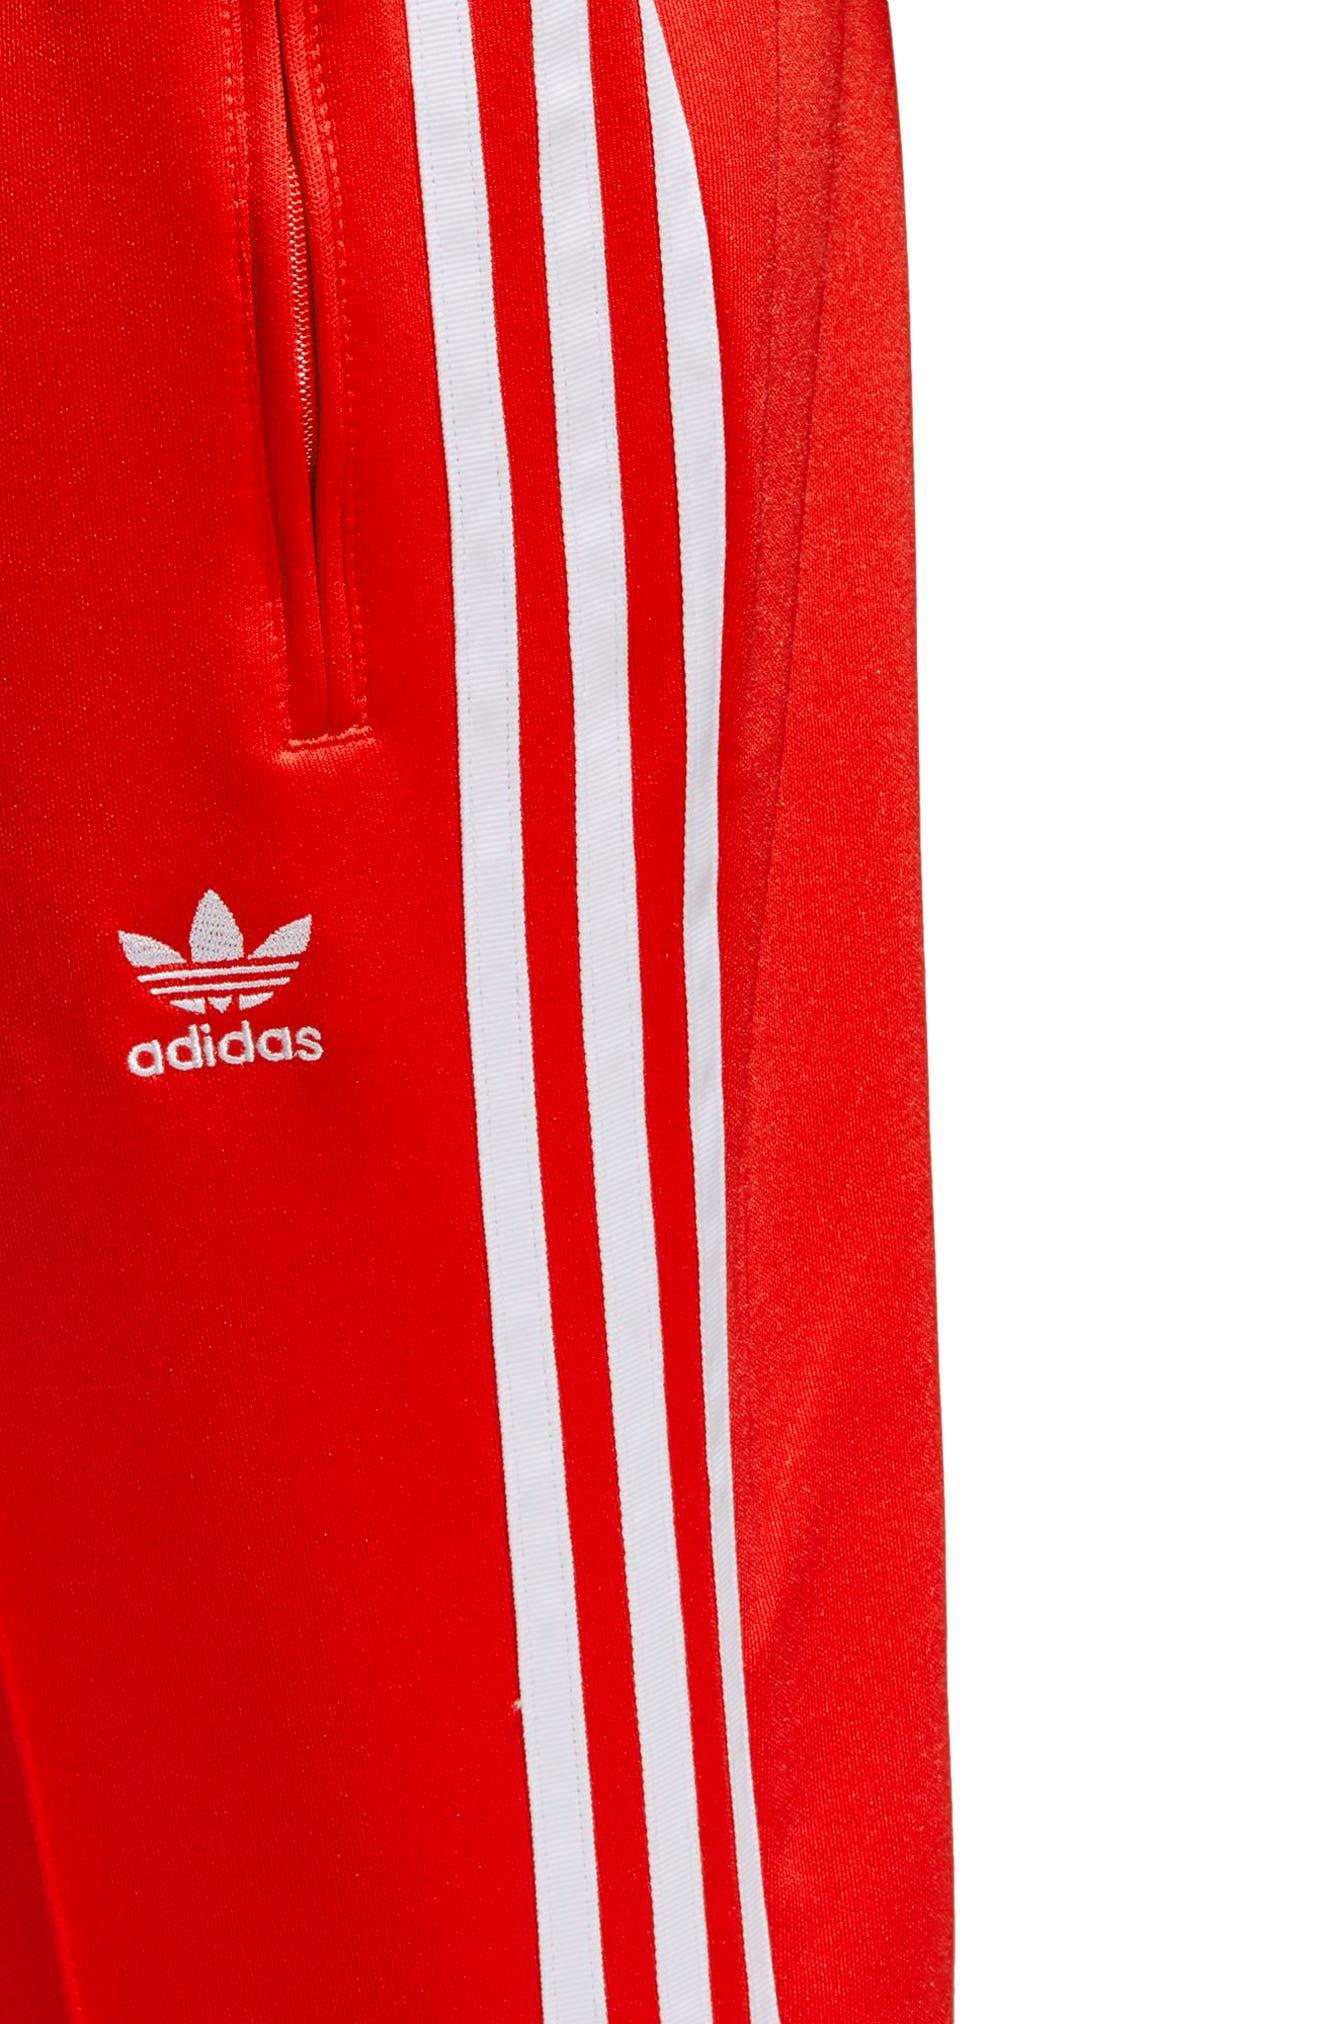 ,                             adidas SST Track Pants,                             Alternate thumbnail 73, color,                             600